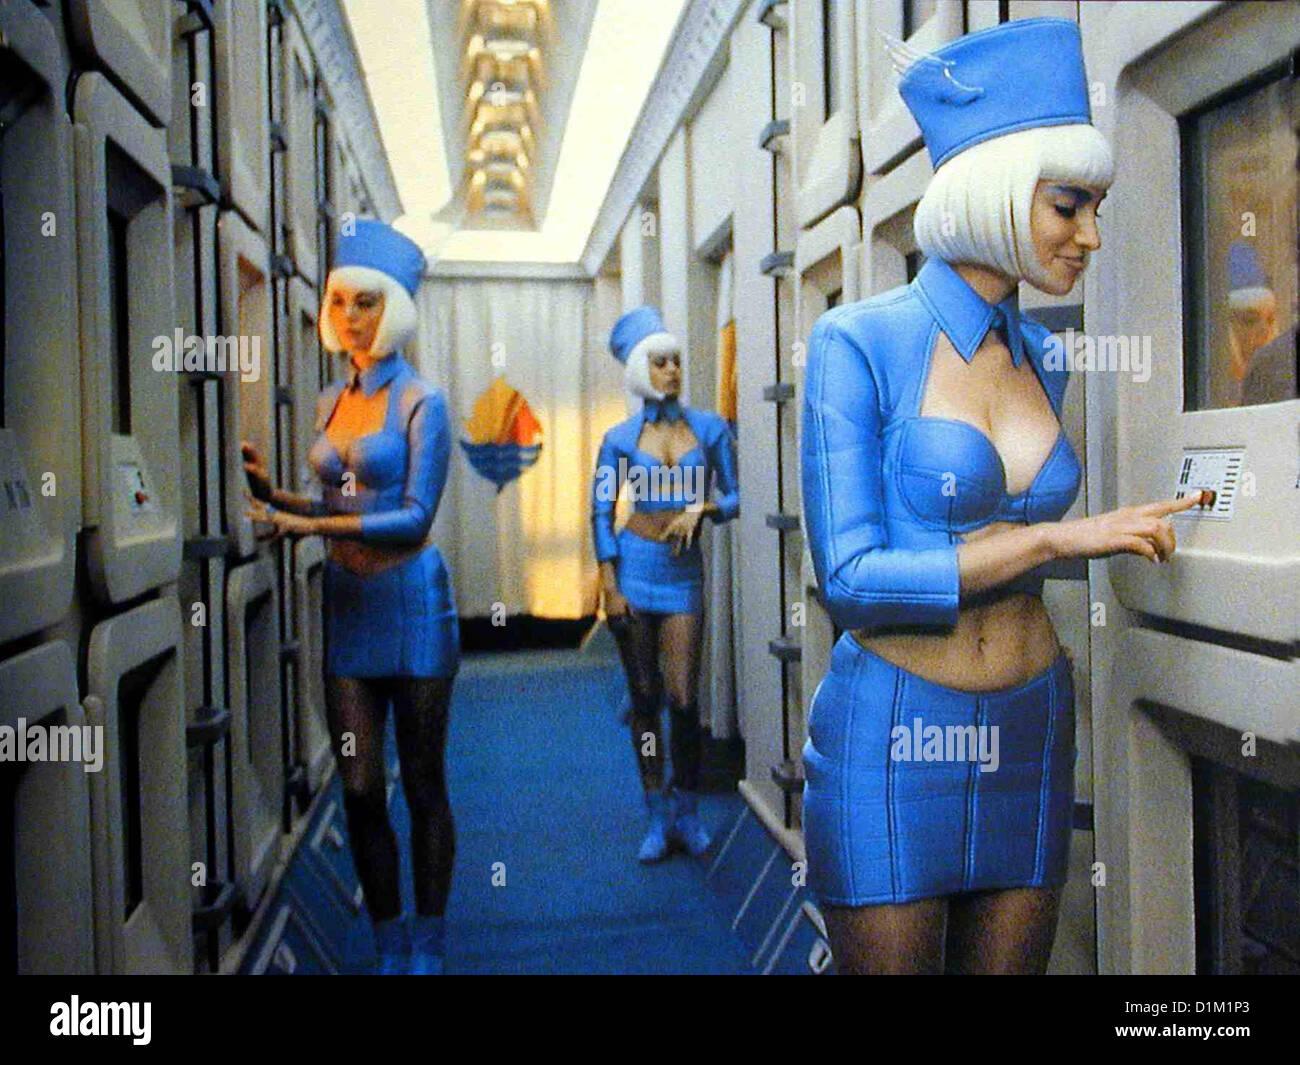 Das Fuenfte Element   Fifth Element, The   Szene *** Local Caption *** 1997  -- - Stock Image